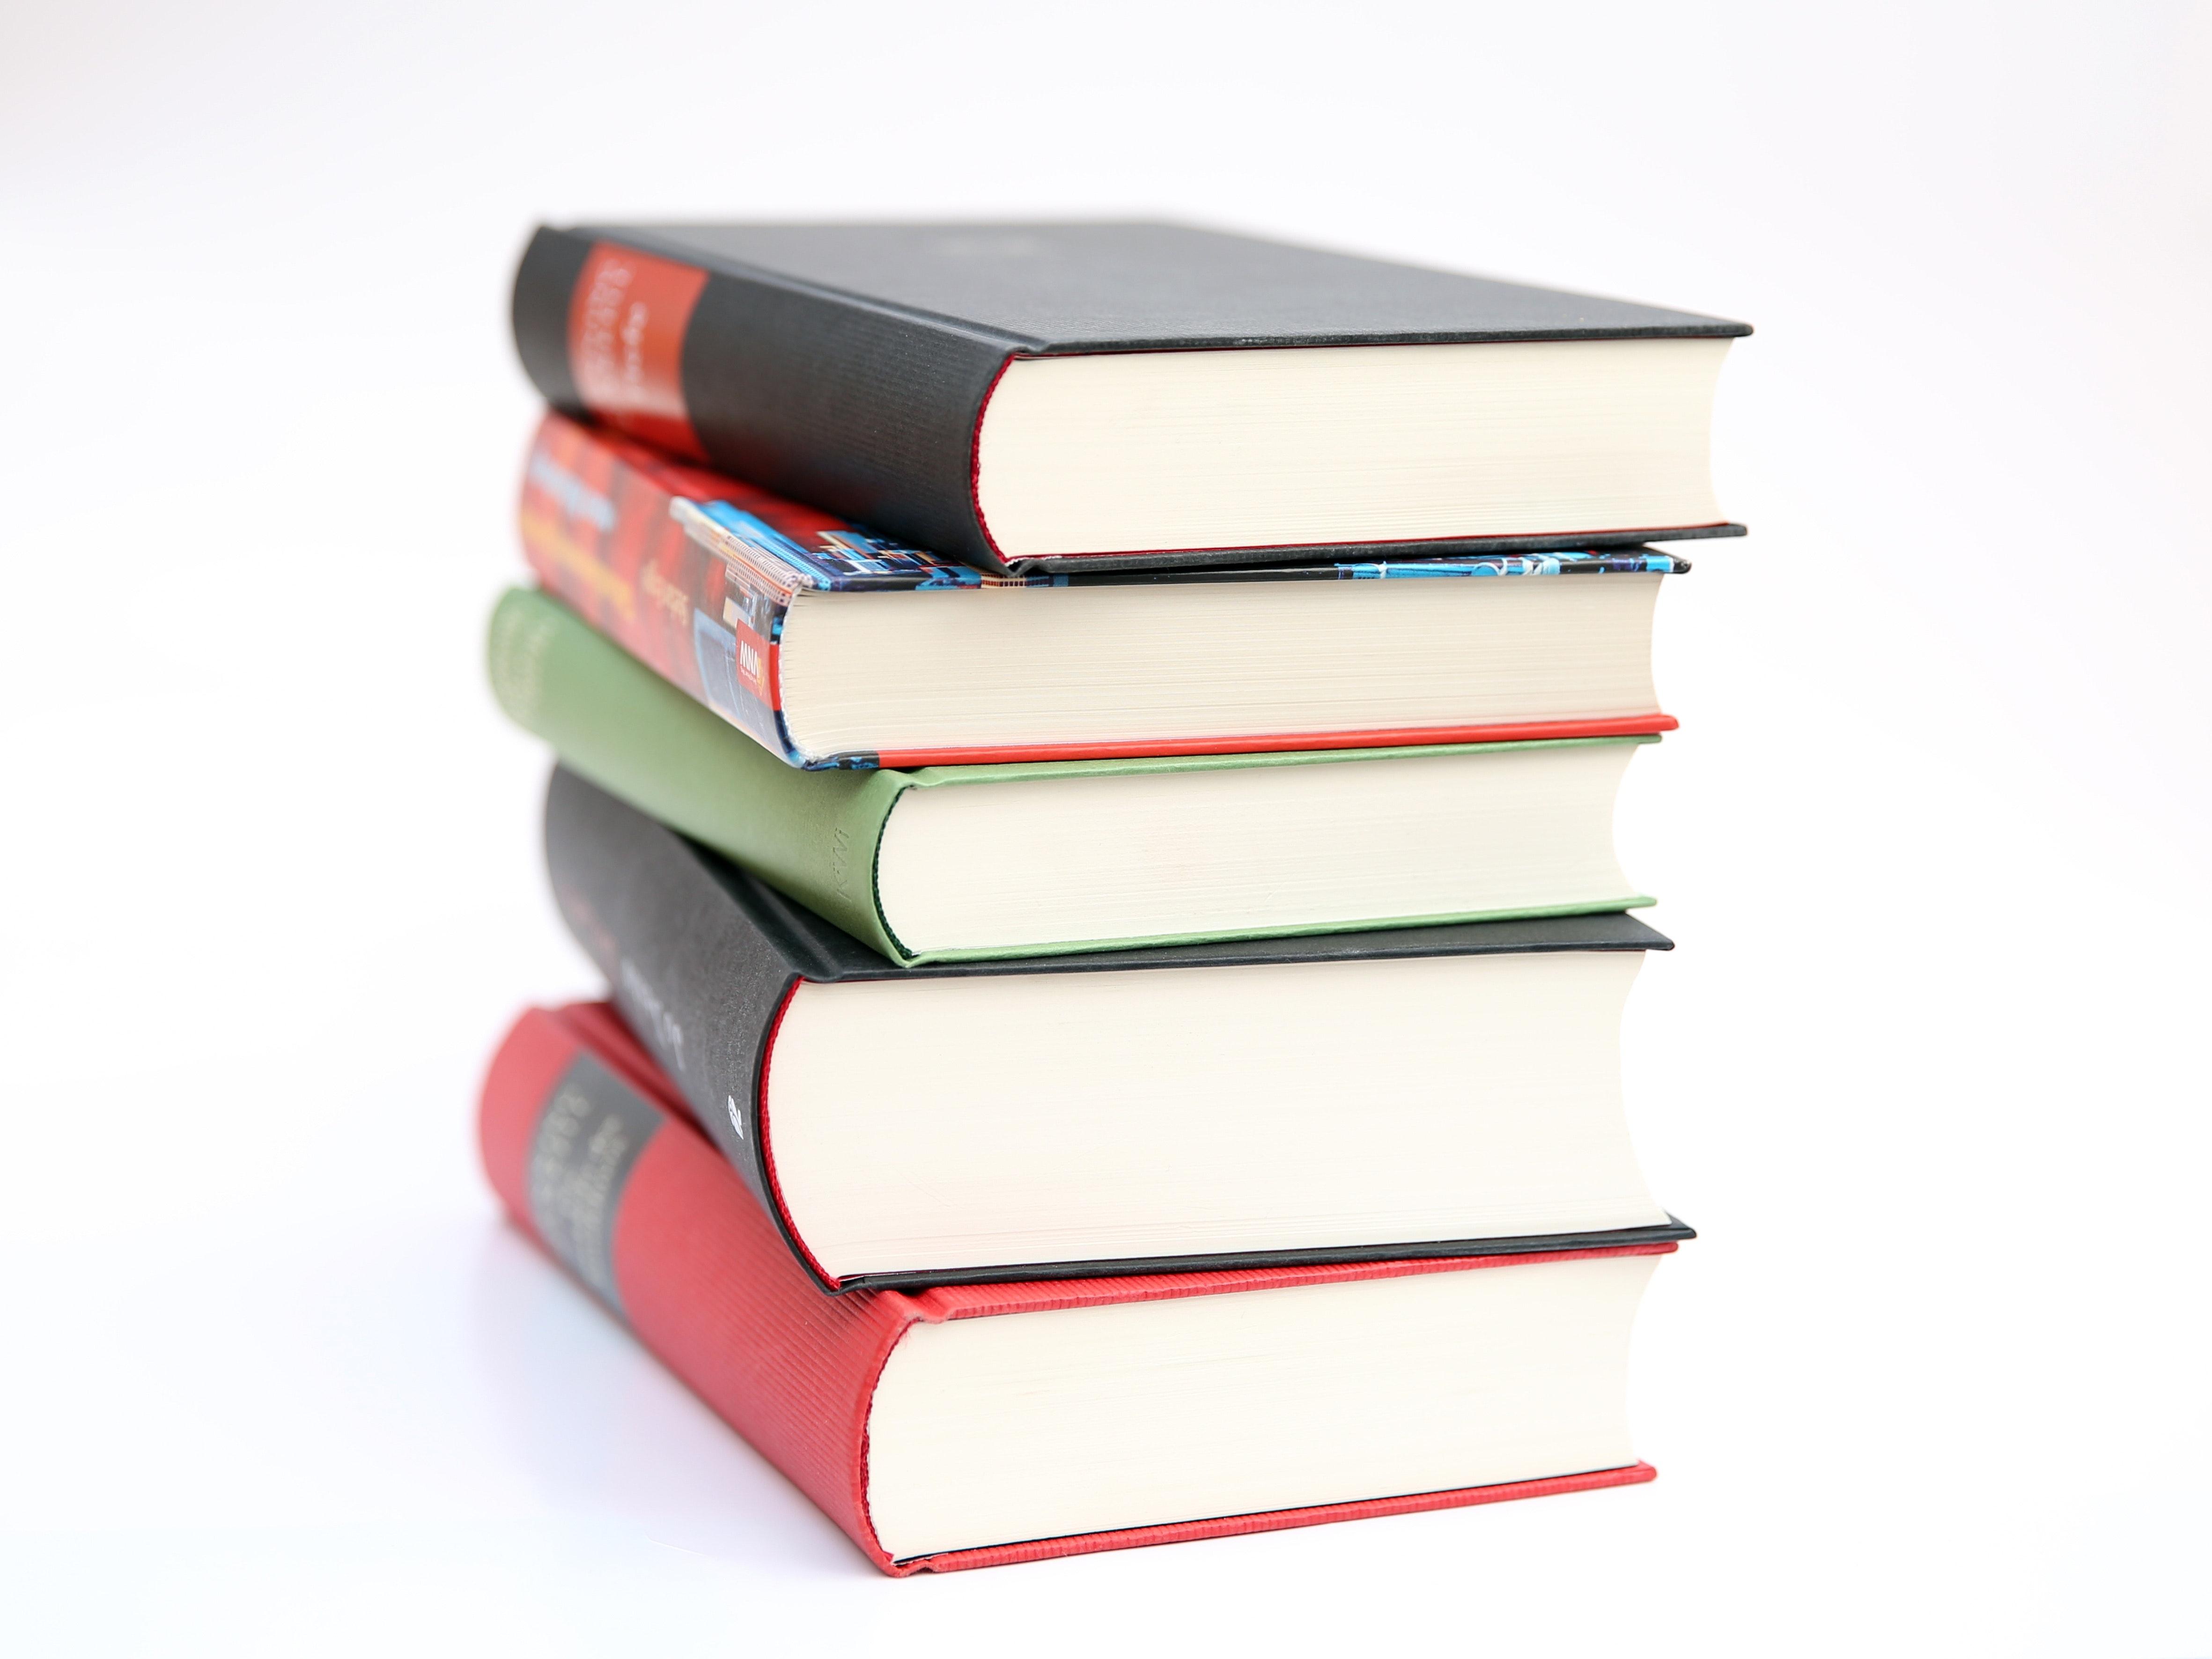 Similar photos pile of red and blue hardbound books